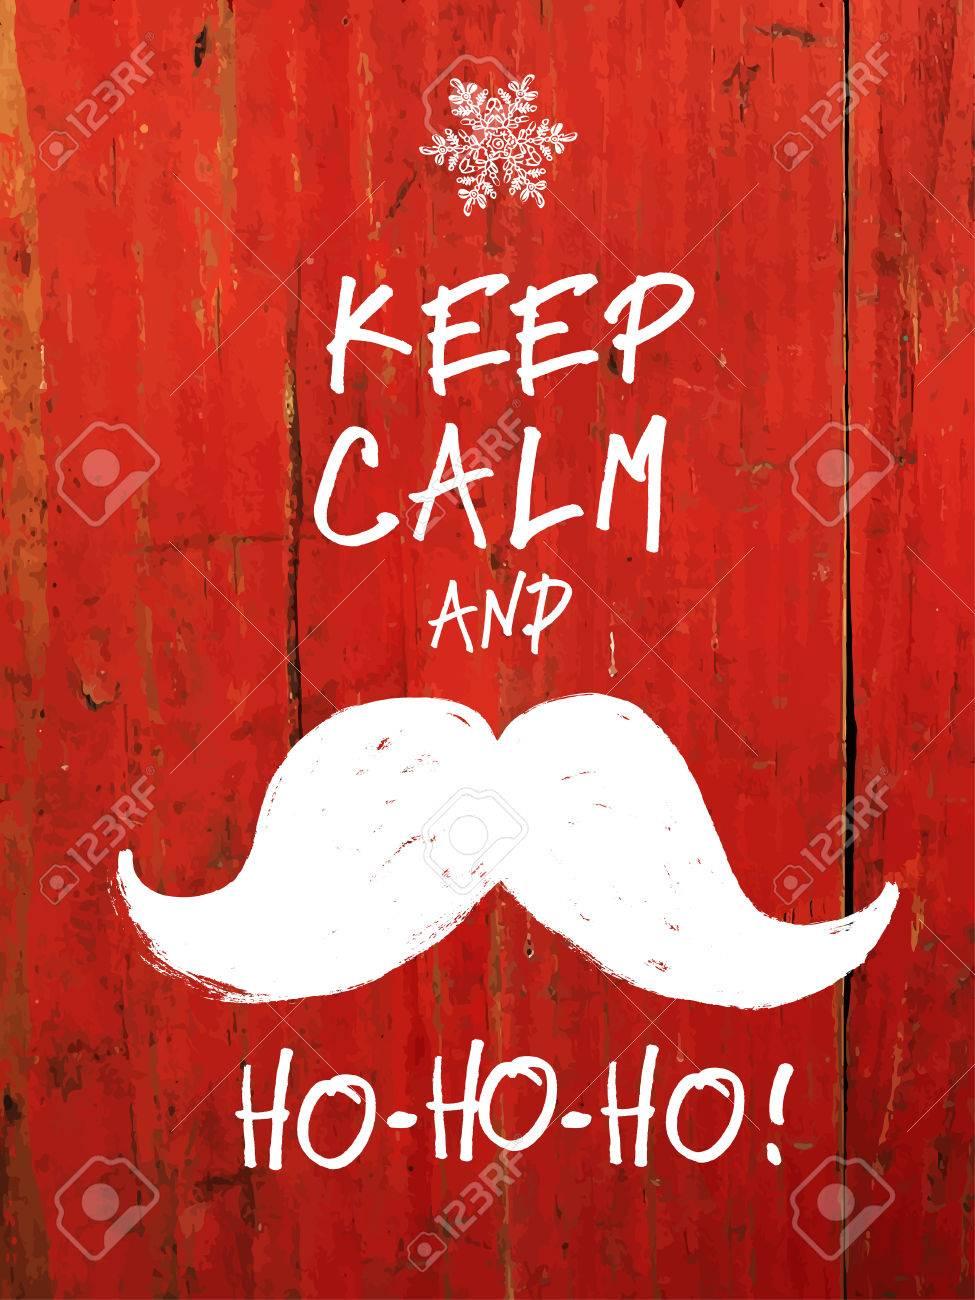 Keep Calm And... White Moustache and Ho-Ho-Ho! words. Christmas funny card design - 34692673